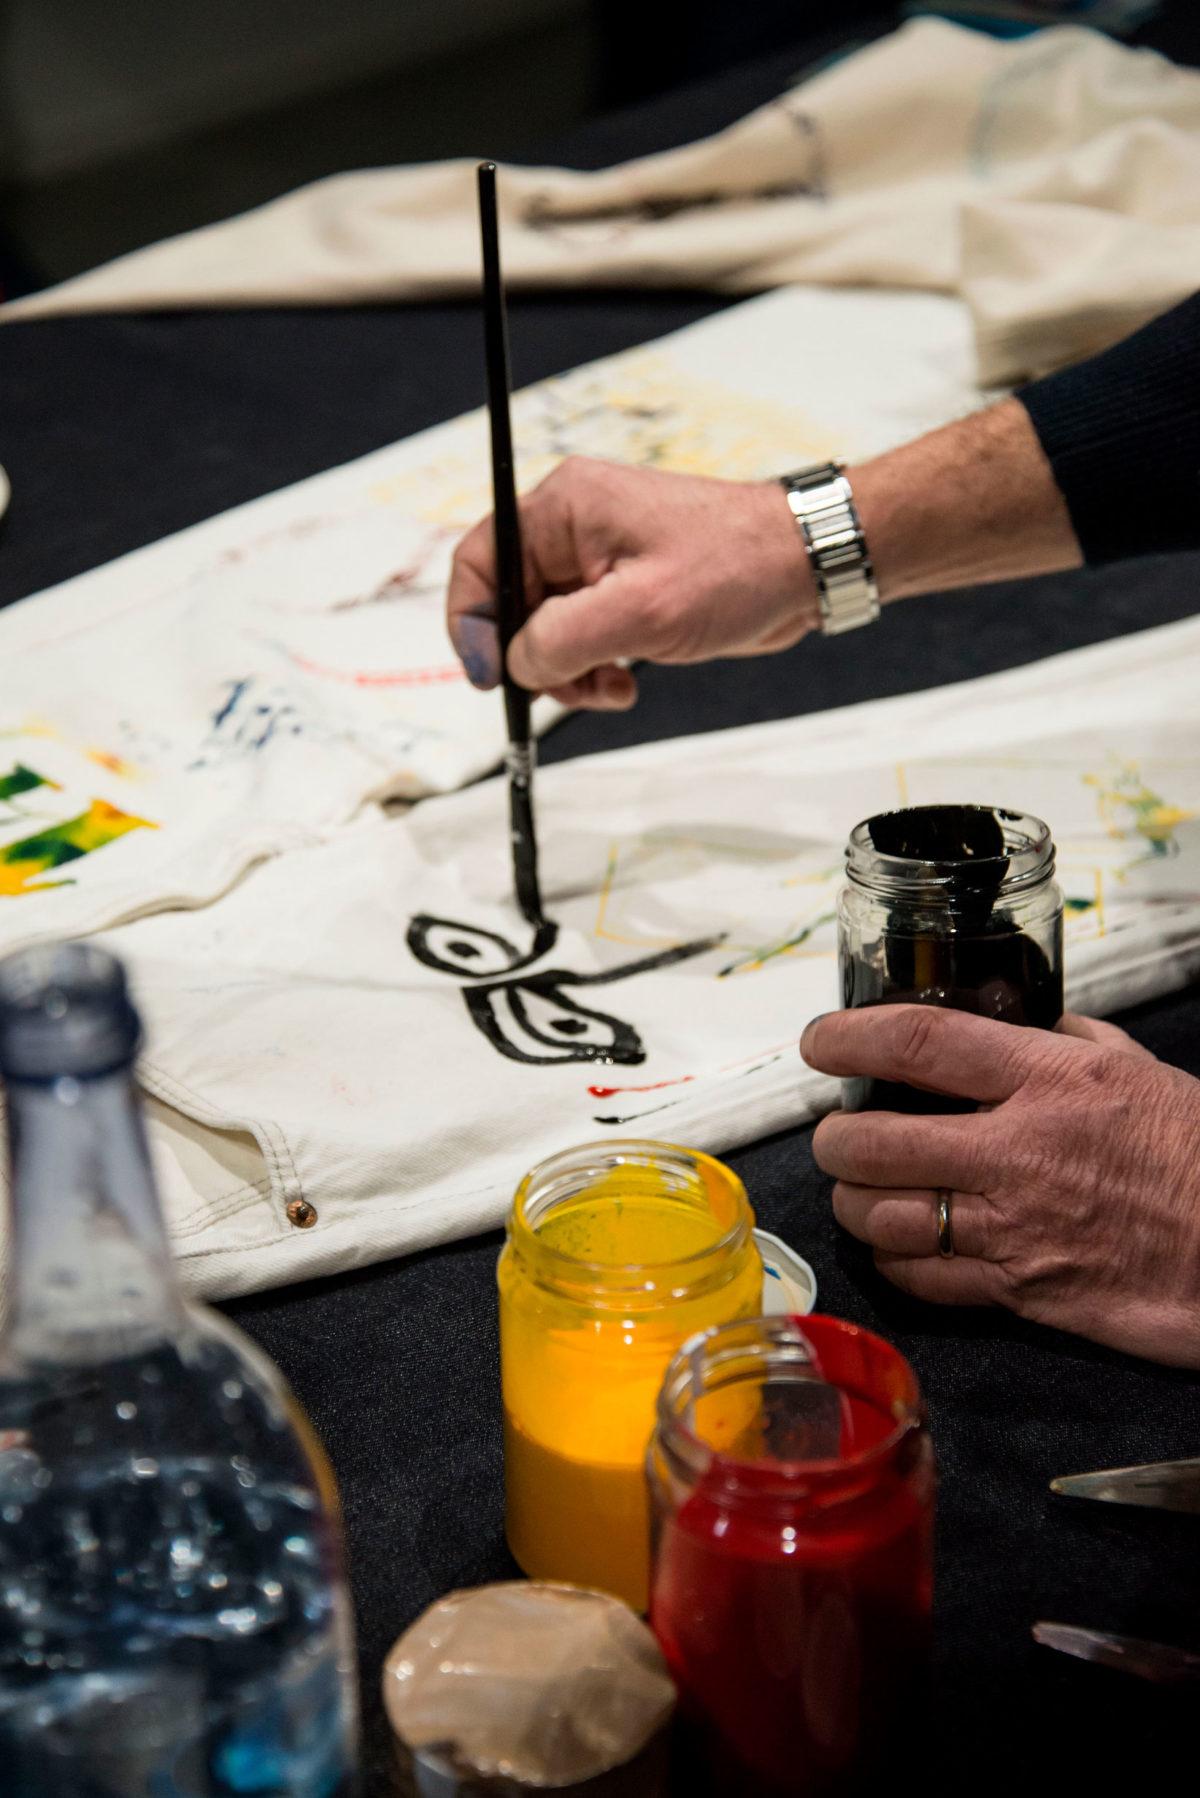 Jenas Art Upcycle: experimenting